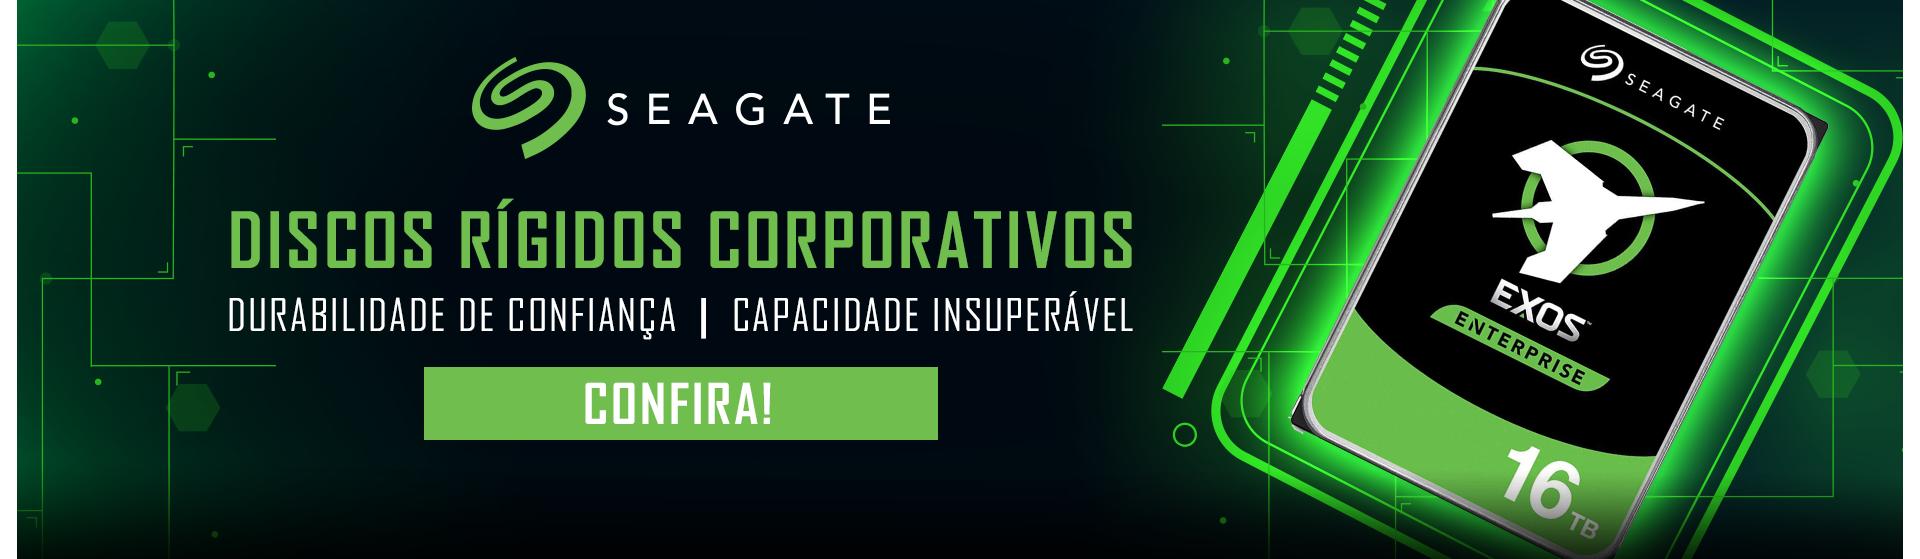 Seagate middle